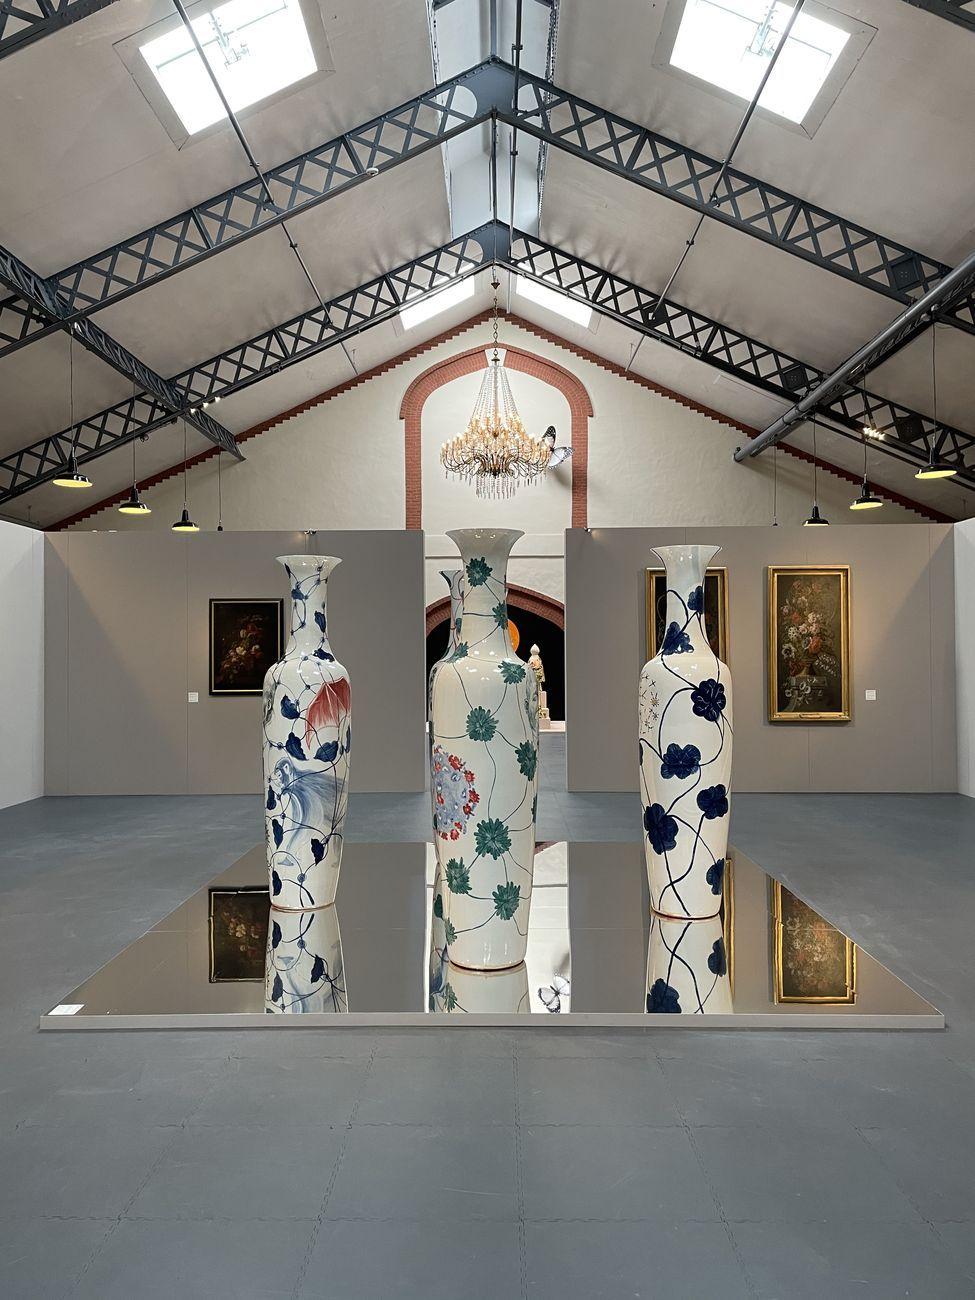 Barthélémy Toguo, Vaincre le virus ! V, VI, XIII,XVII, 2016. Installation view at Tenuta Pommery Cellier Pompadour